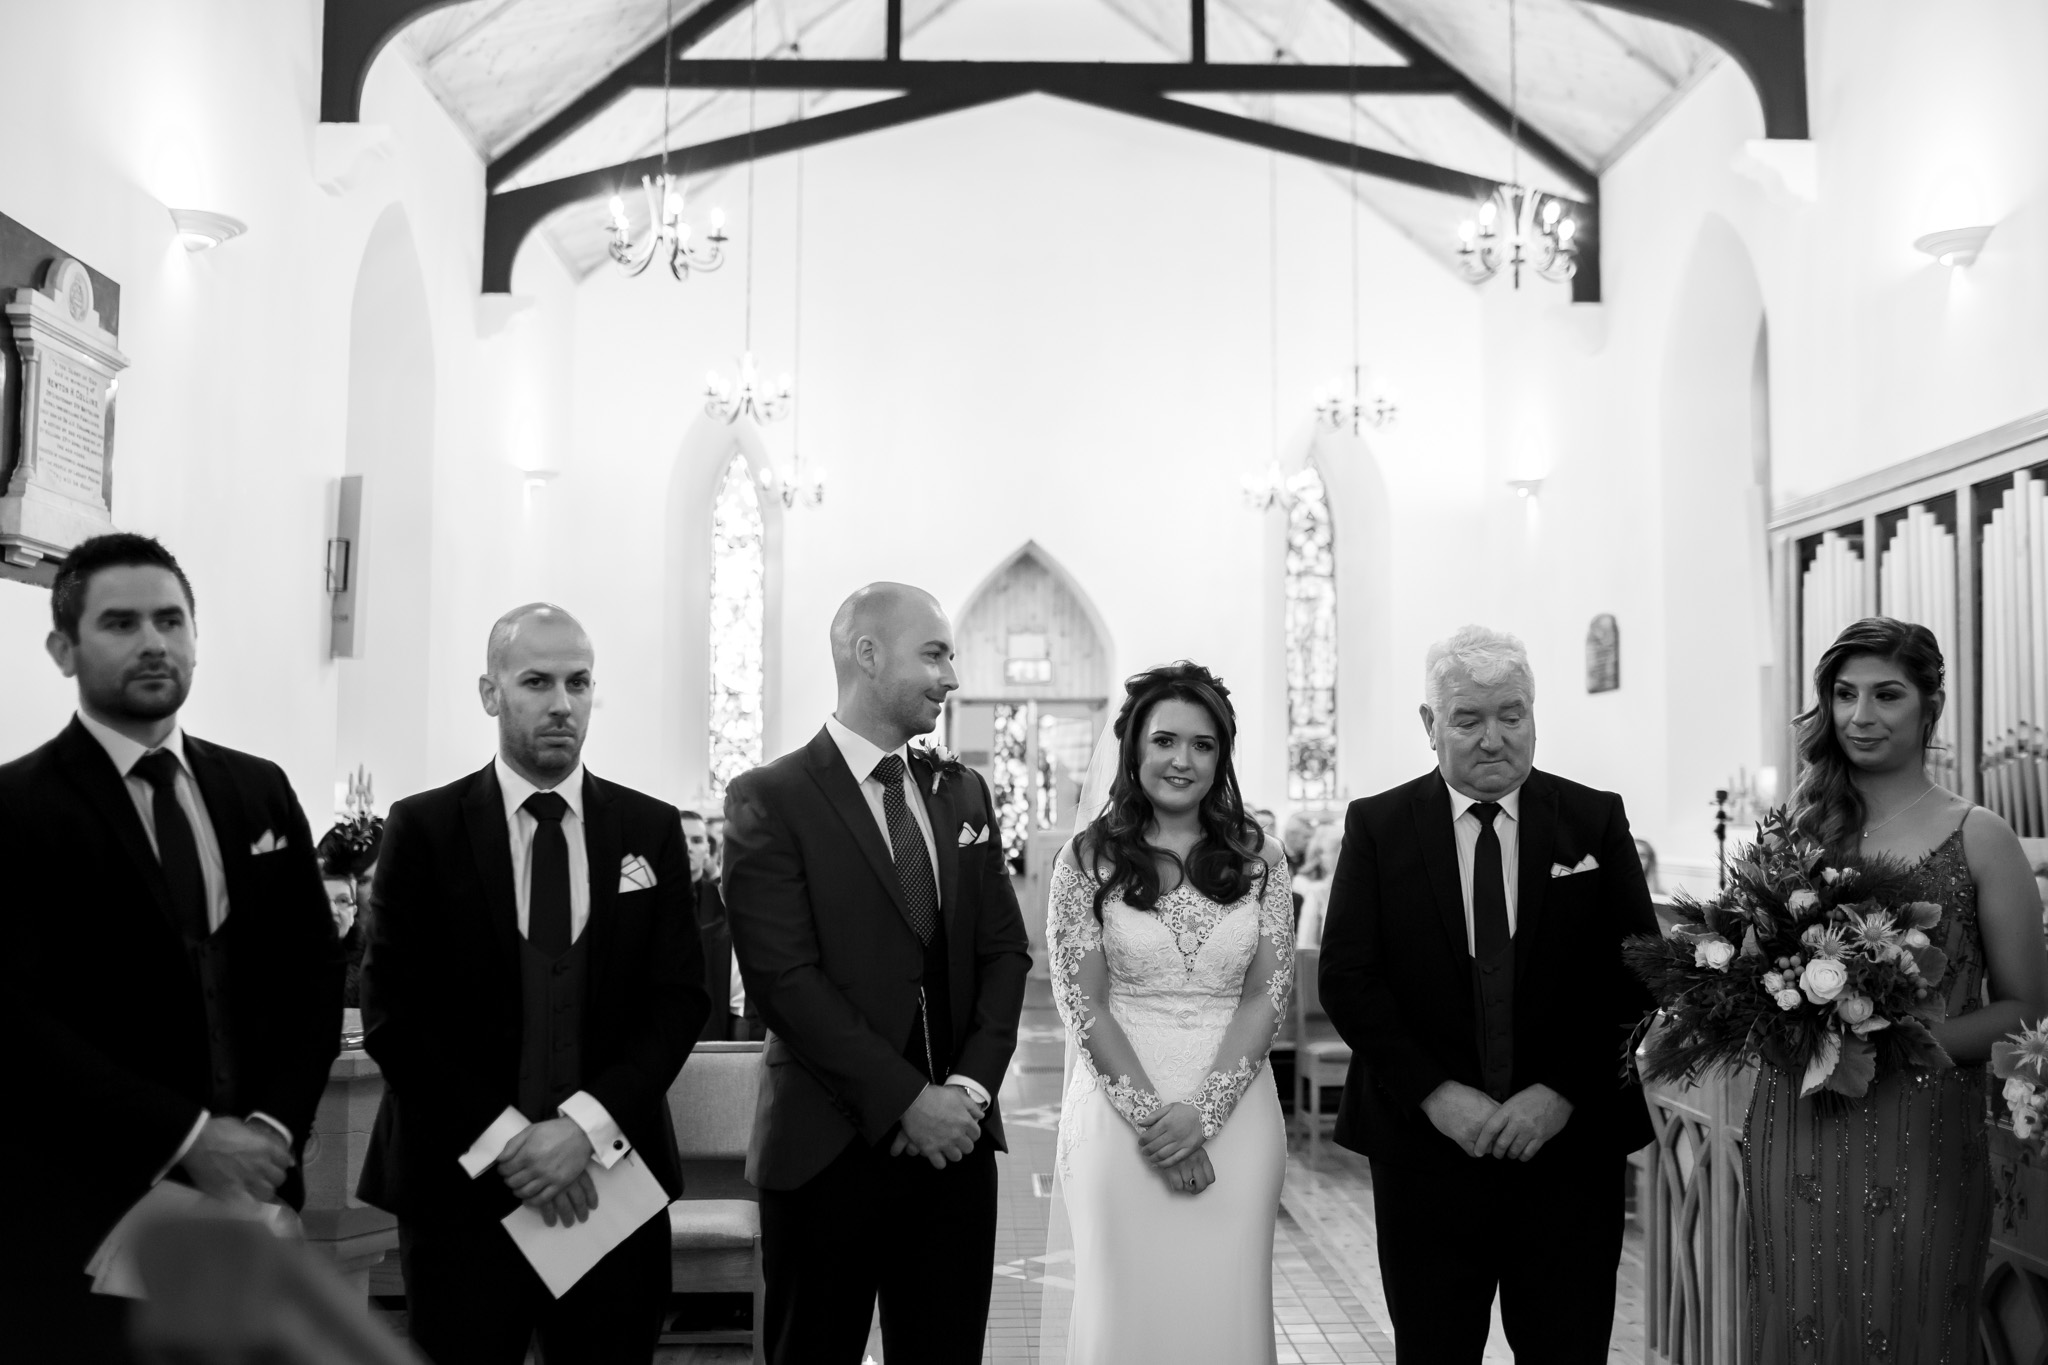 Mark_Barnes_Northern_Ireland_wedding_photographer_Harveys_Point_Donegall_Wedding_photography-Adam&Gemma-18.jpg